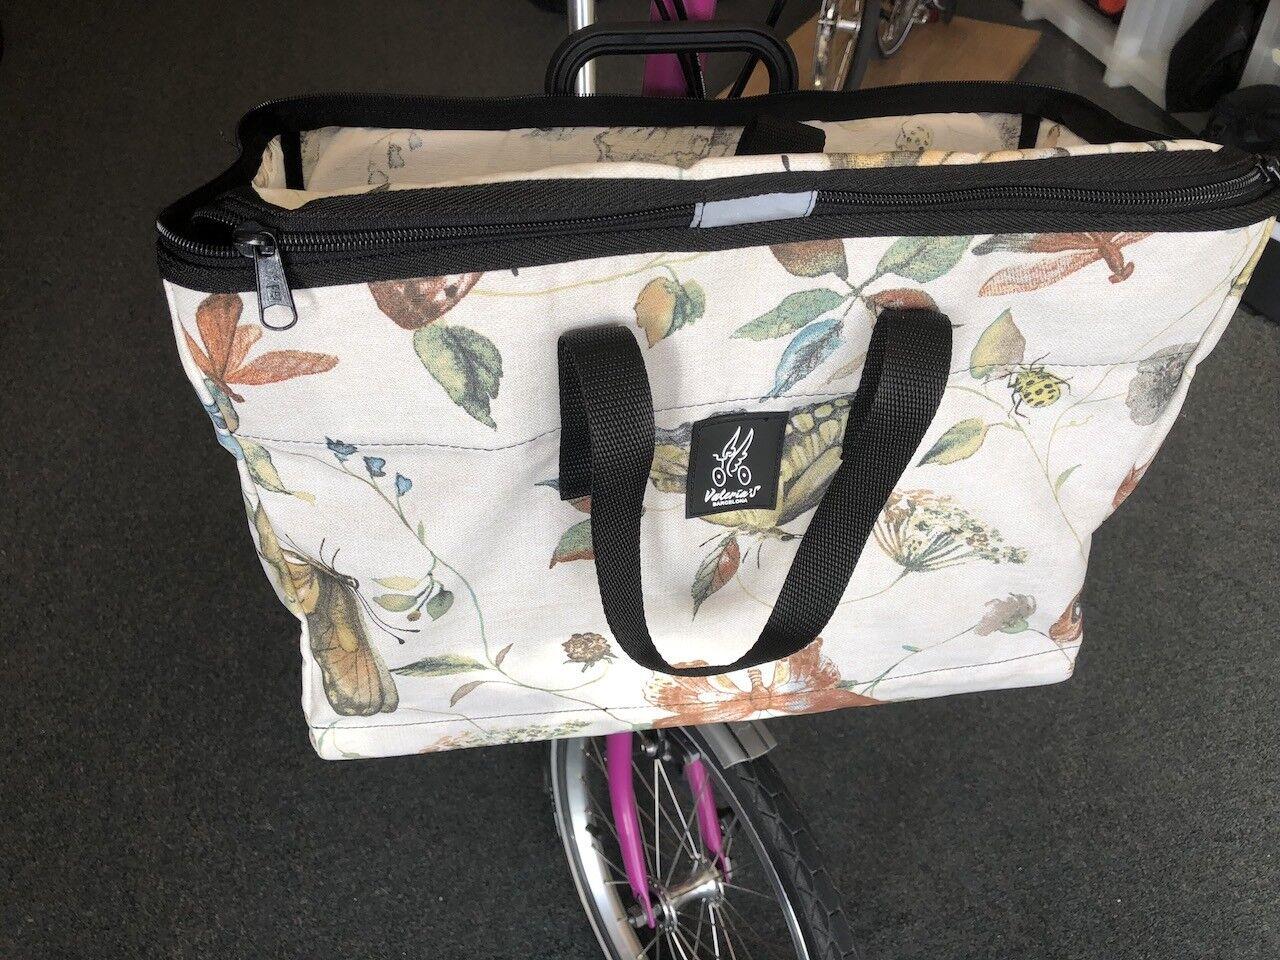 Brompton Folding Bike Front Basket, Improved Design - Butterflies